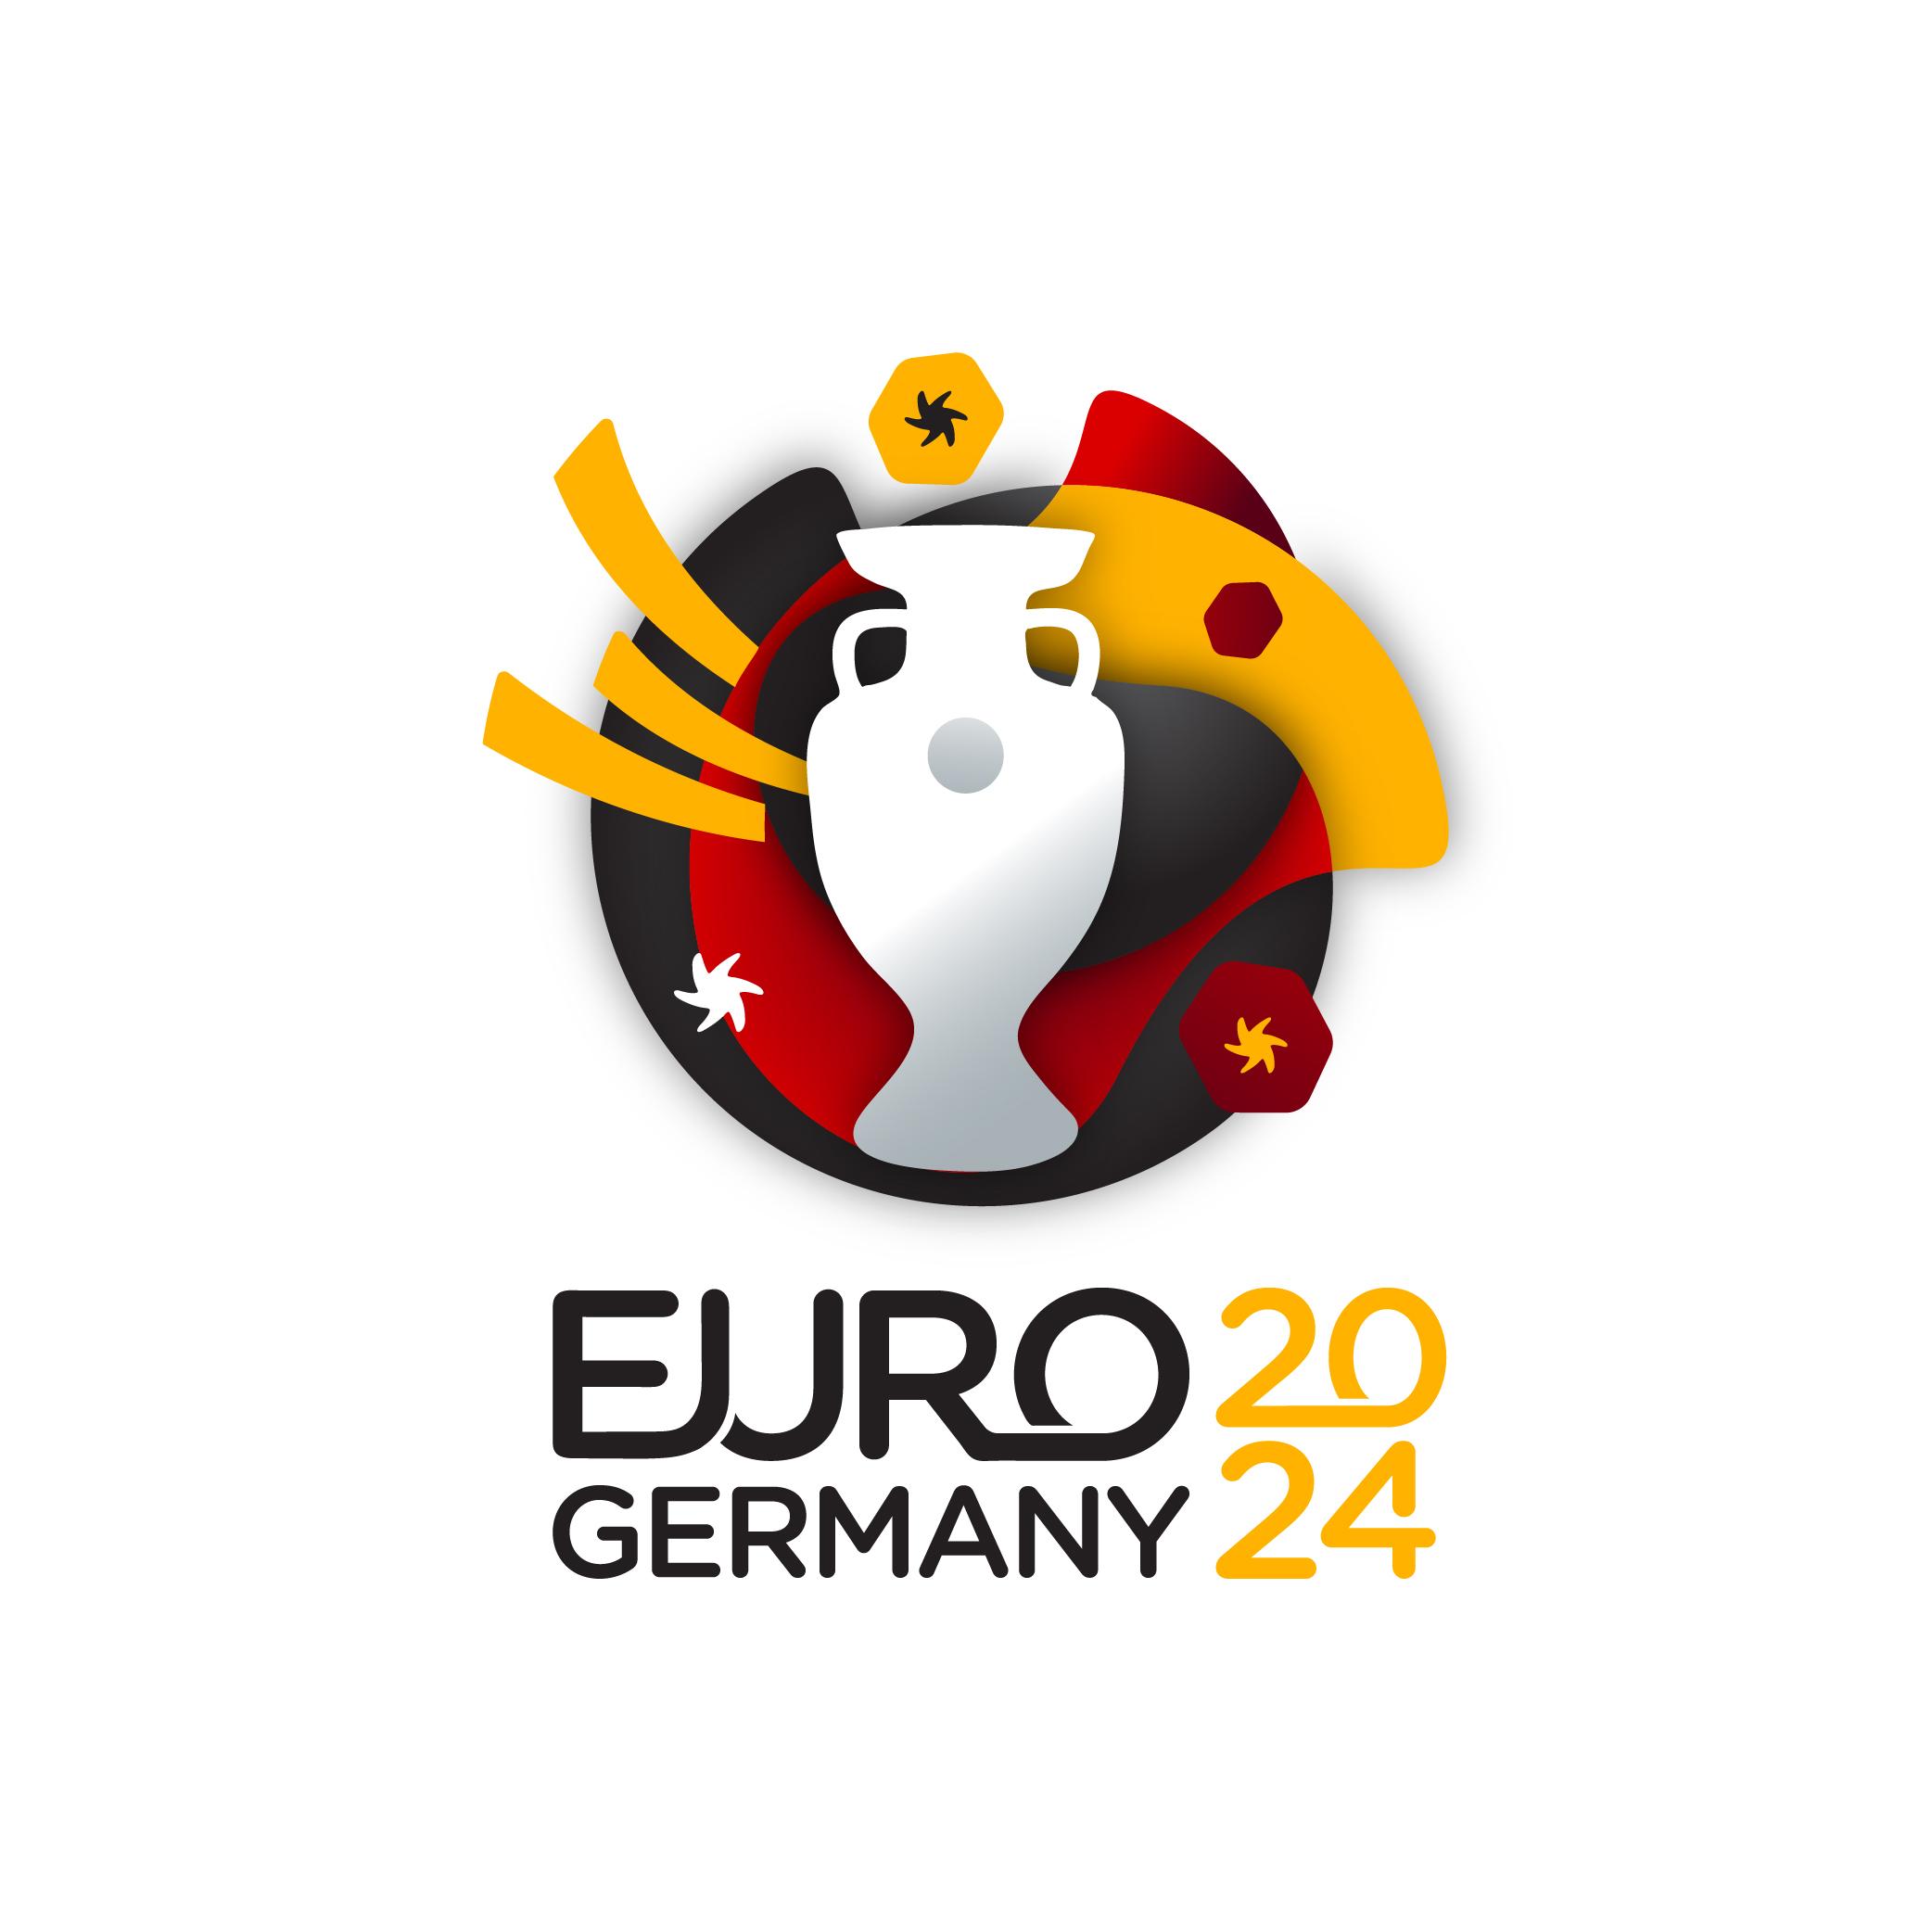 jovoto euro 2024 logo proposal aim shoot score your 2024 bid logo deutscher fussball bund jovoto euro 2024 logo proposal aim